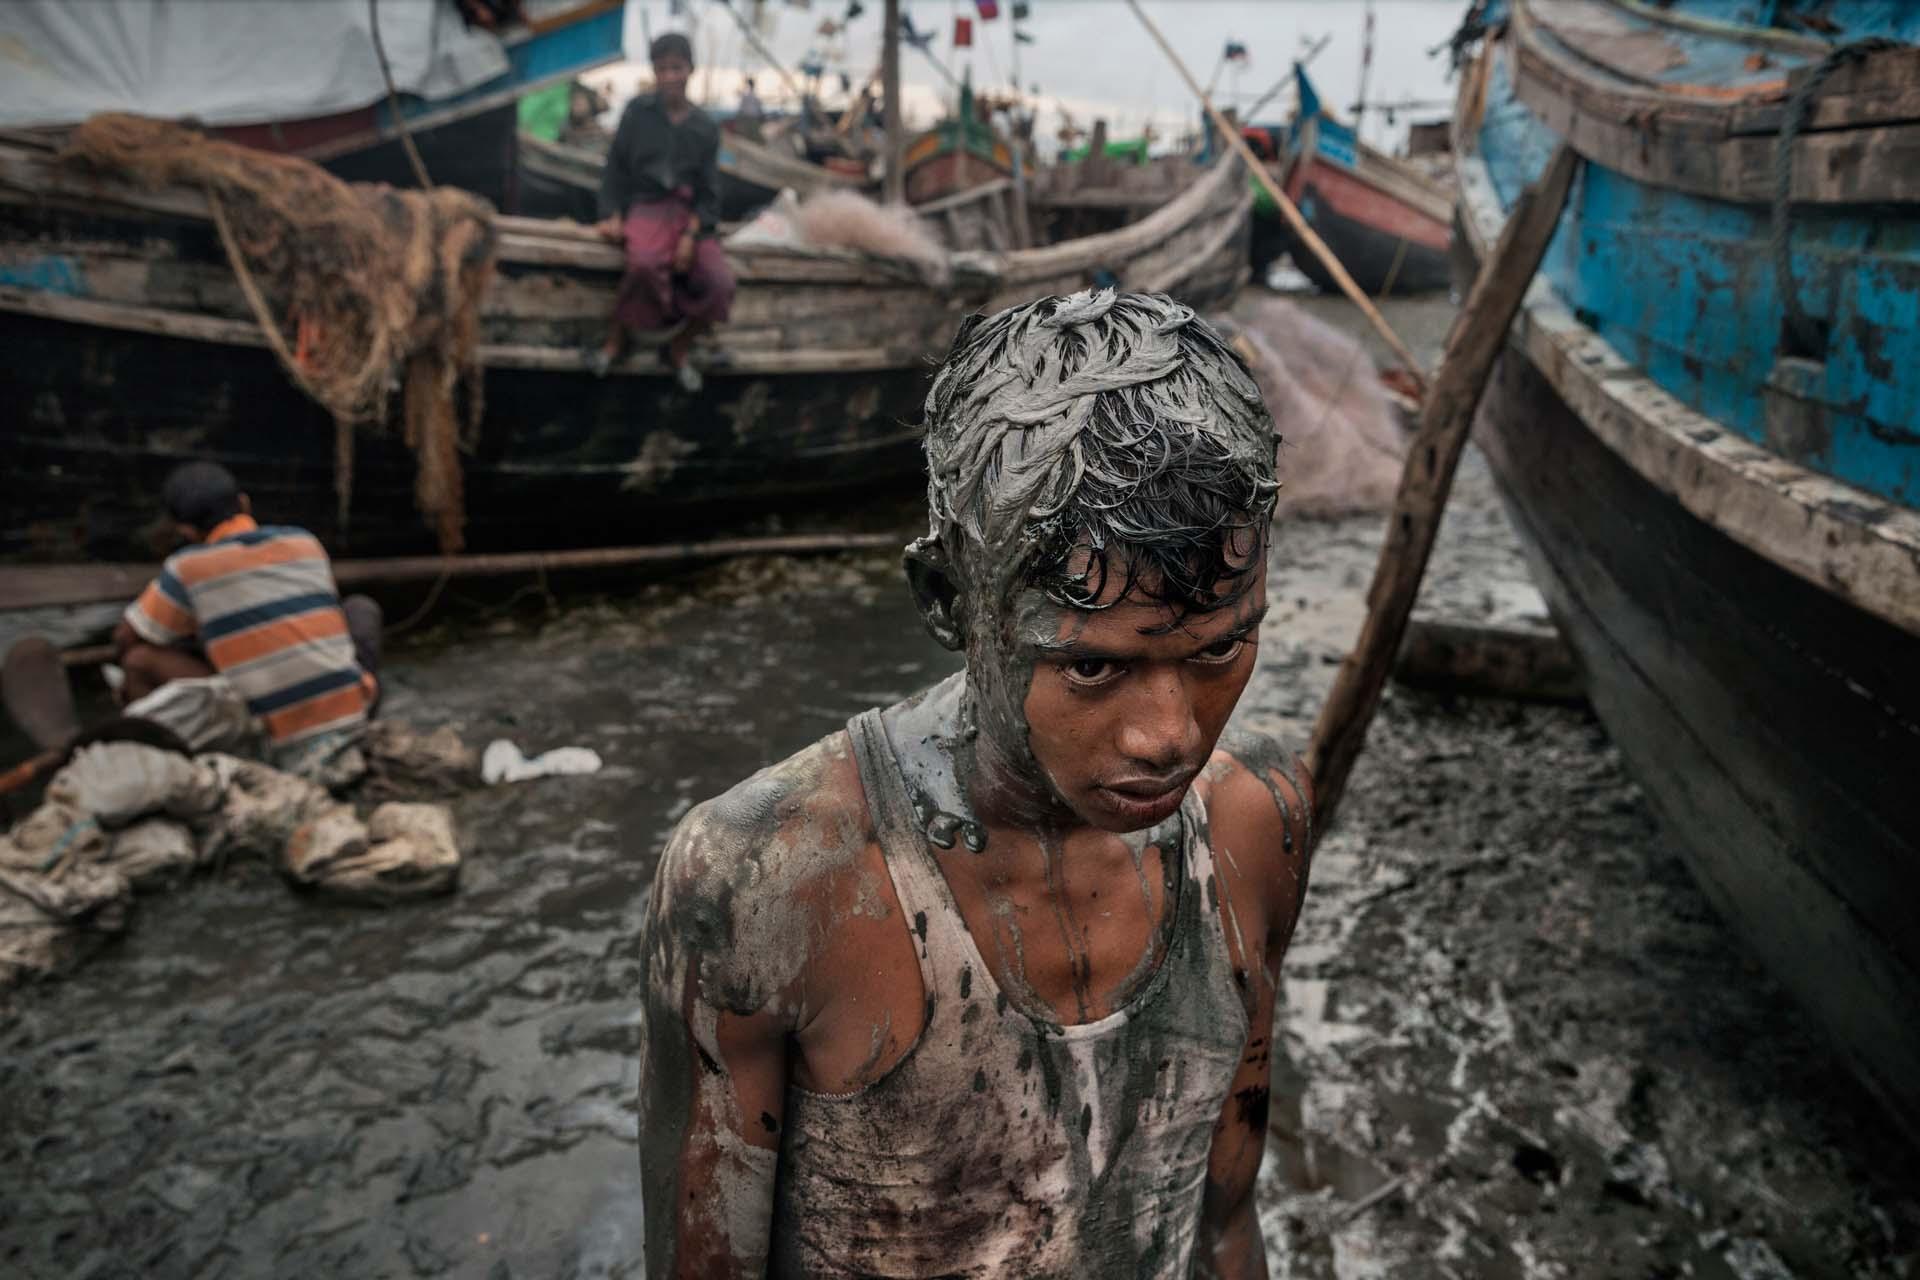 Rohingya story for Wash Post